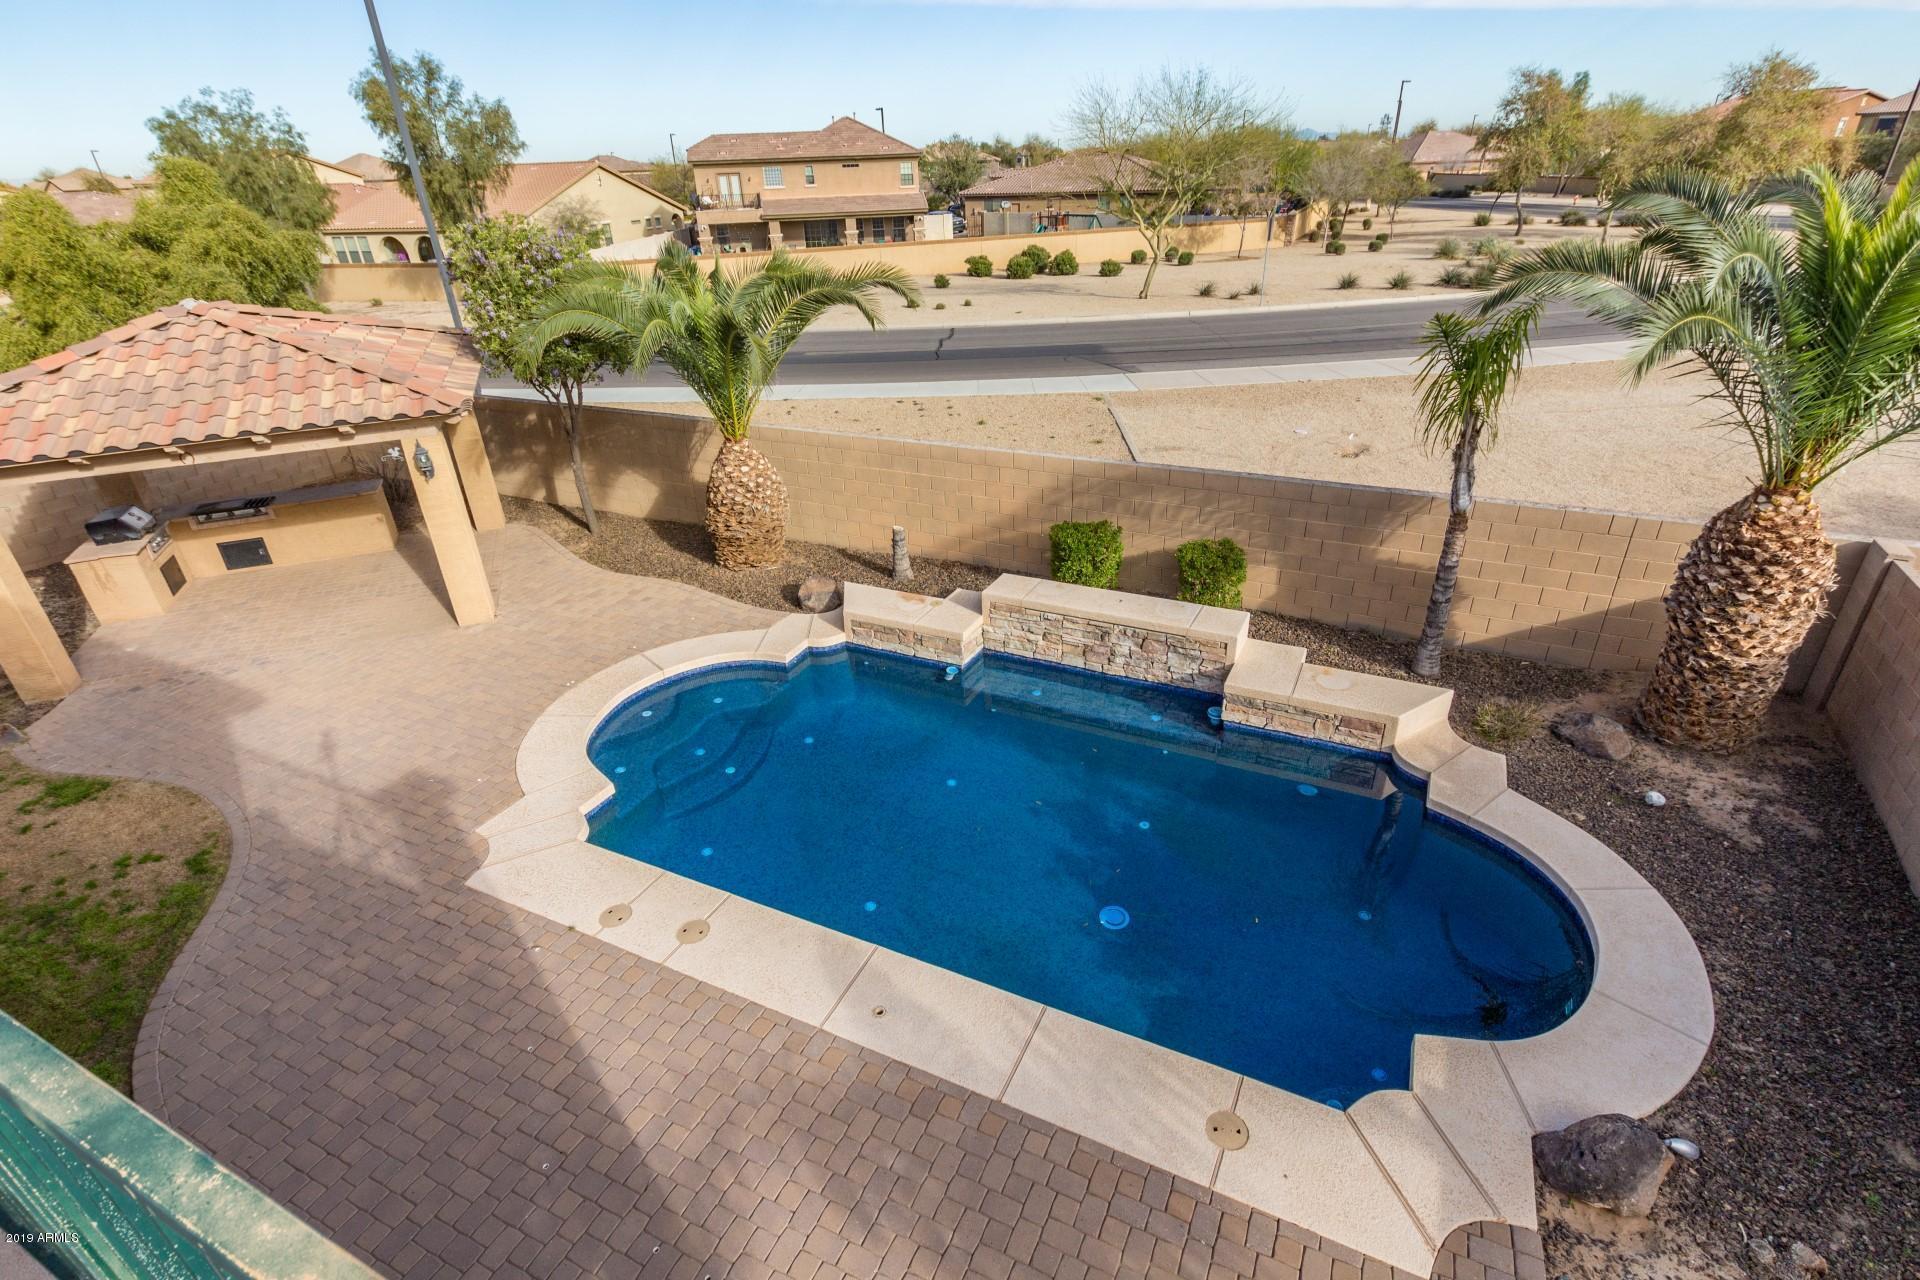 MLS 5895232 3046 E KILLARNEY Street, Gilbert, AZ 85298 Gilbert AZ Country Shadows